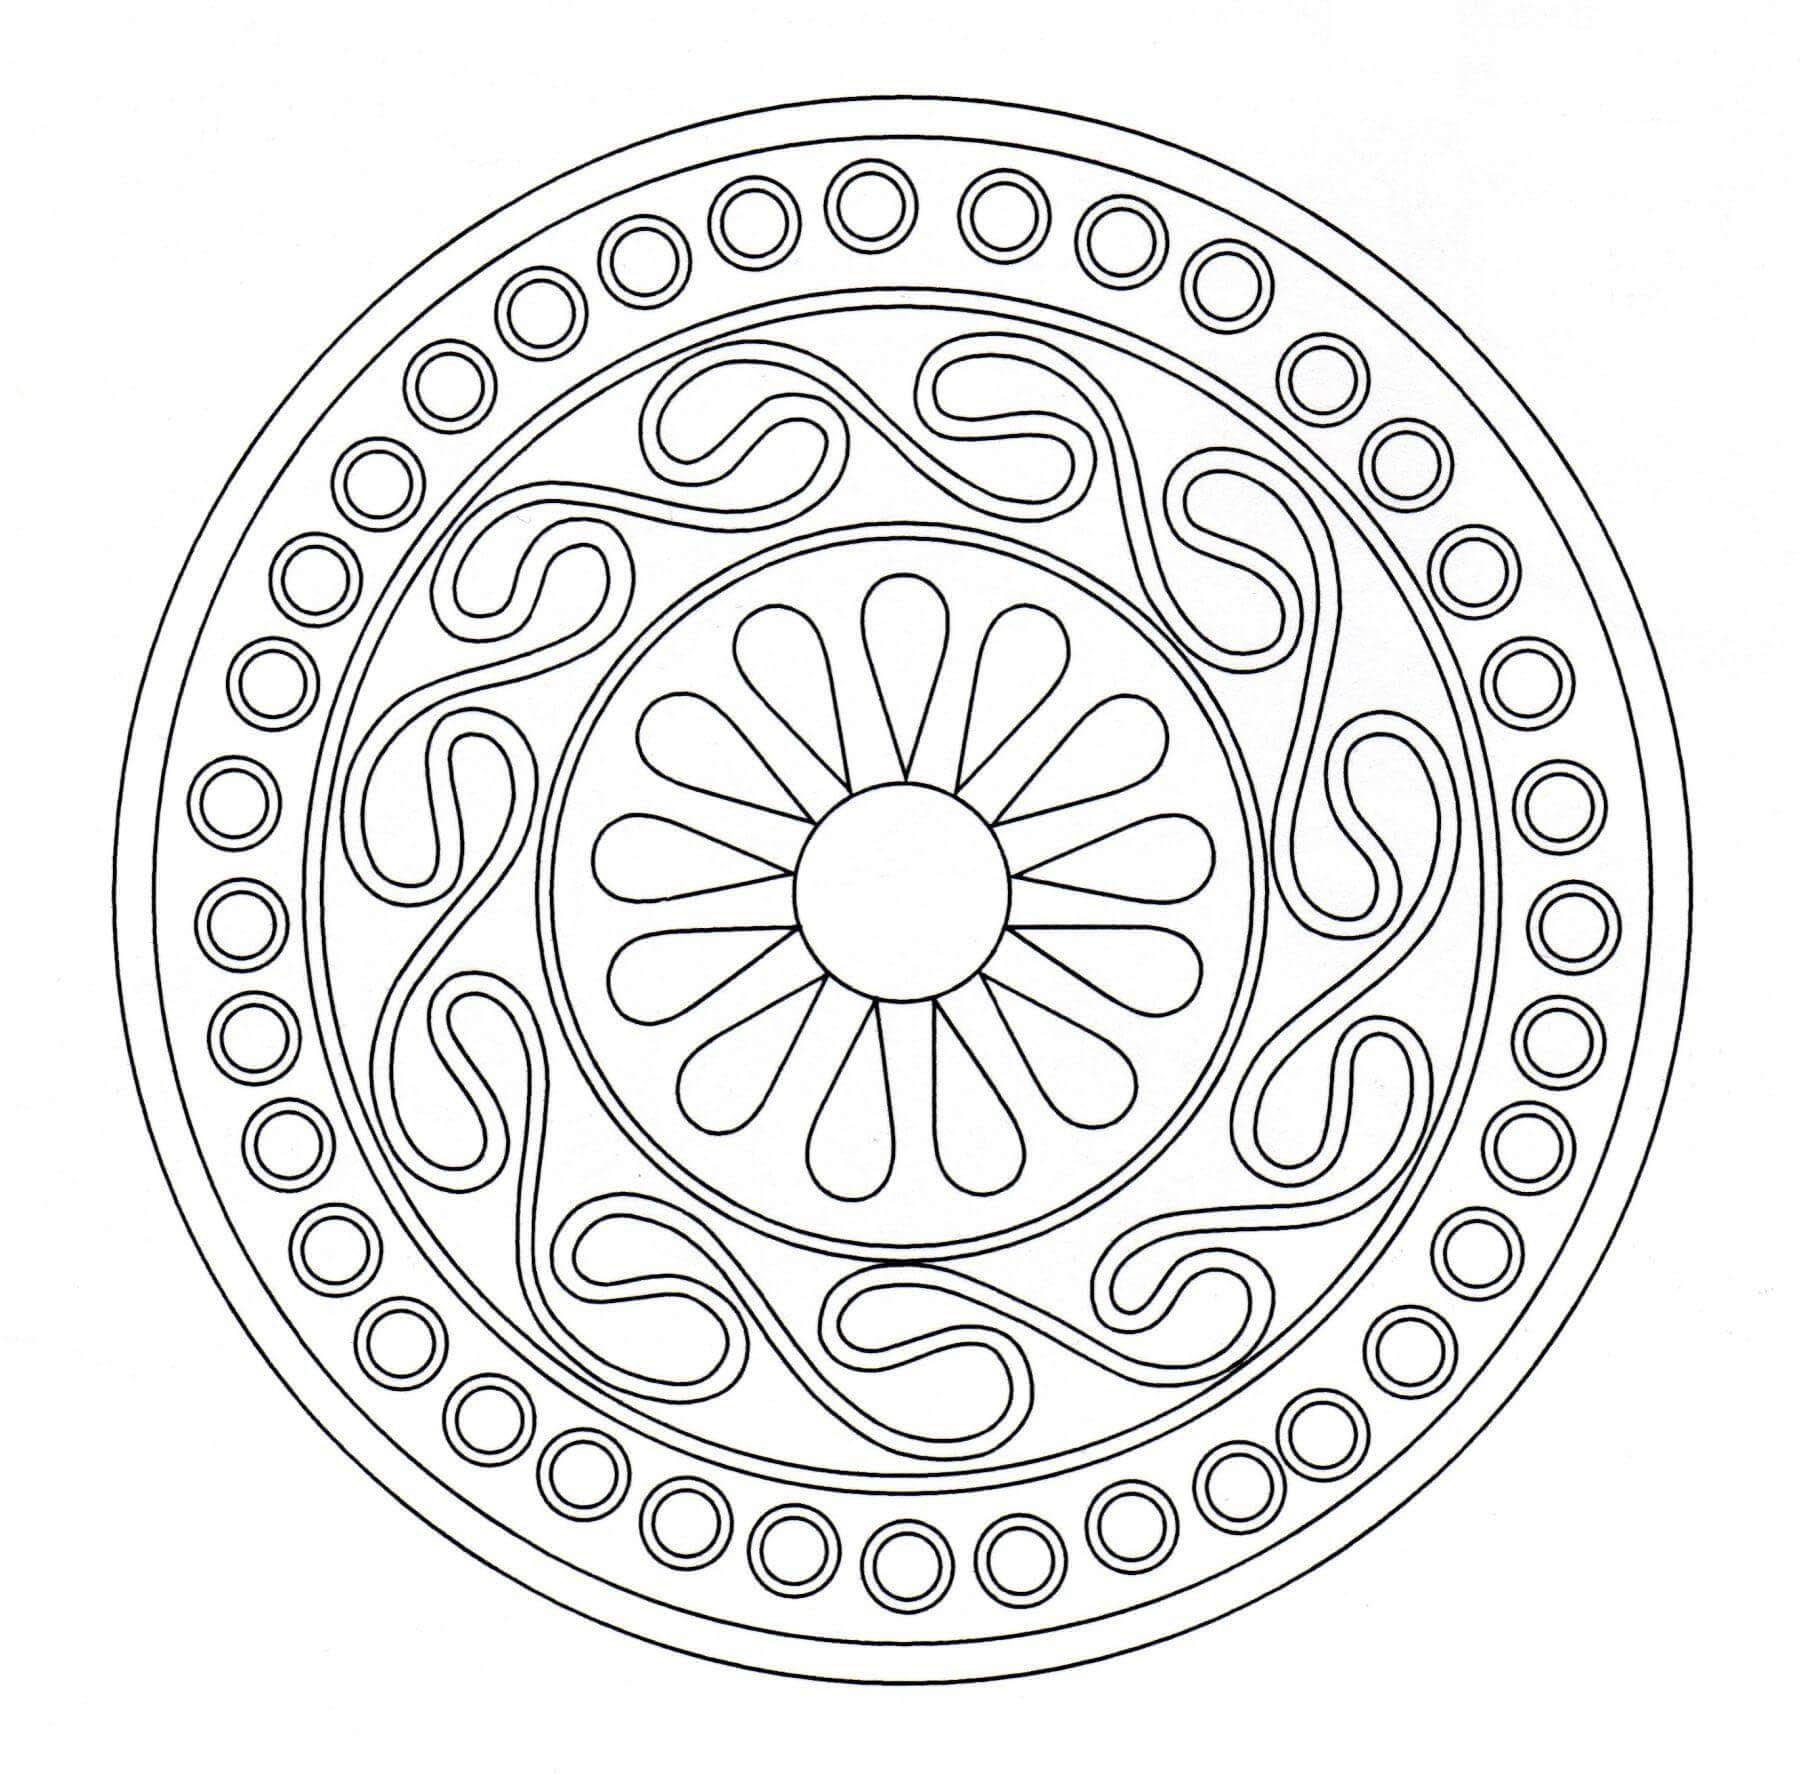 Mandala Monday - Free Celtic Mandalas to Color | 1774x1800